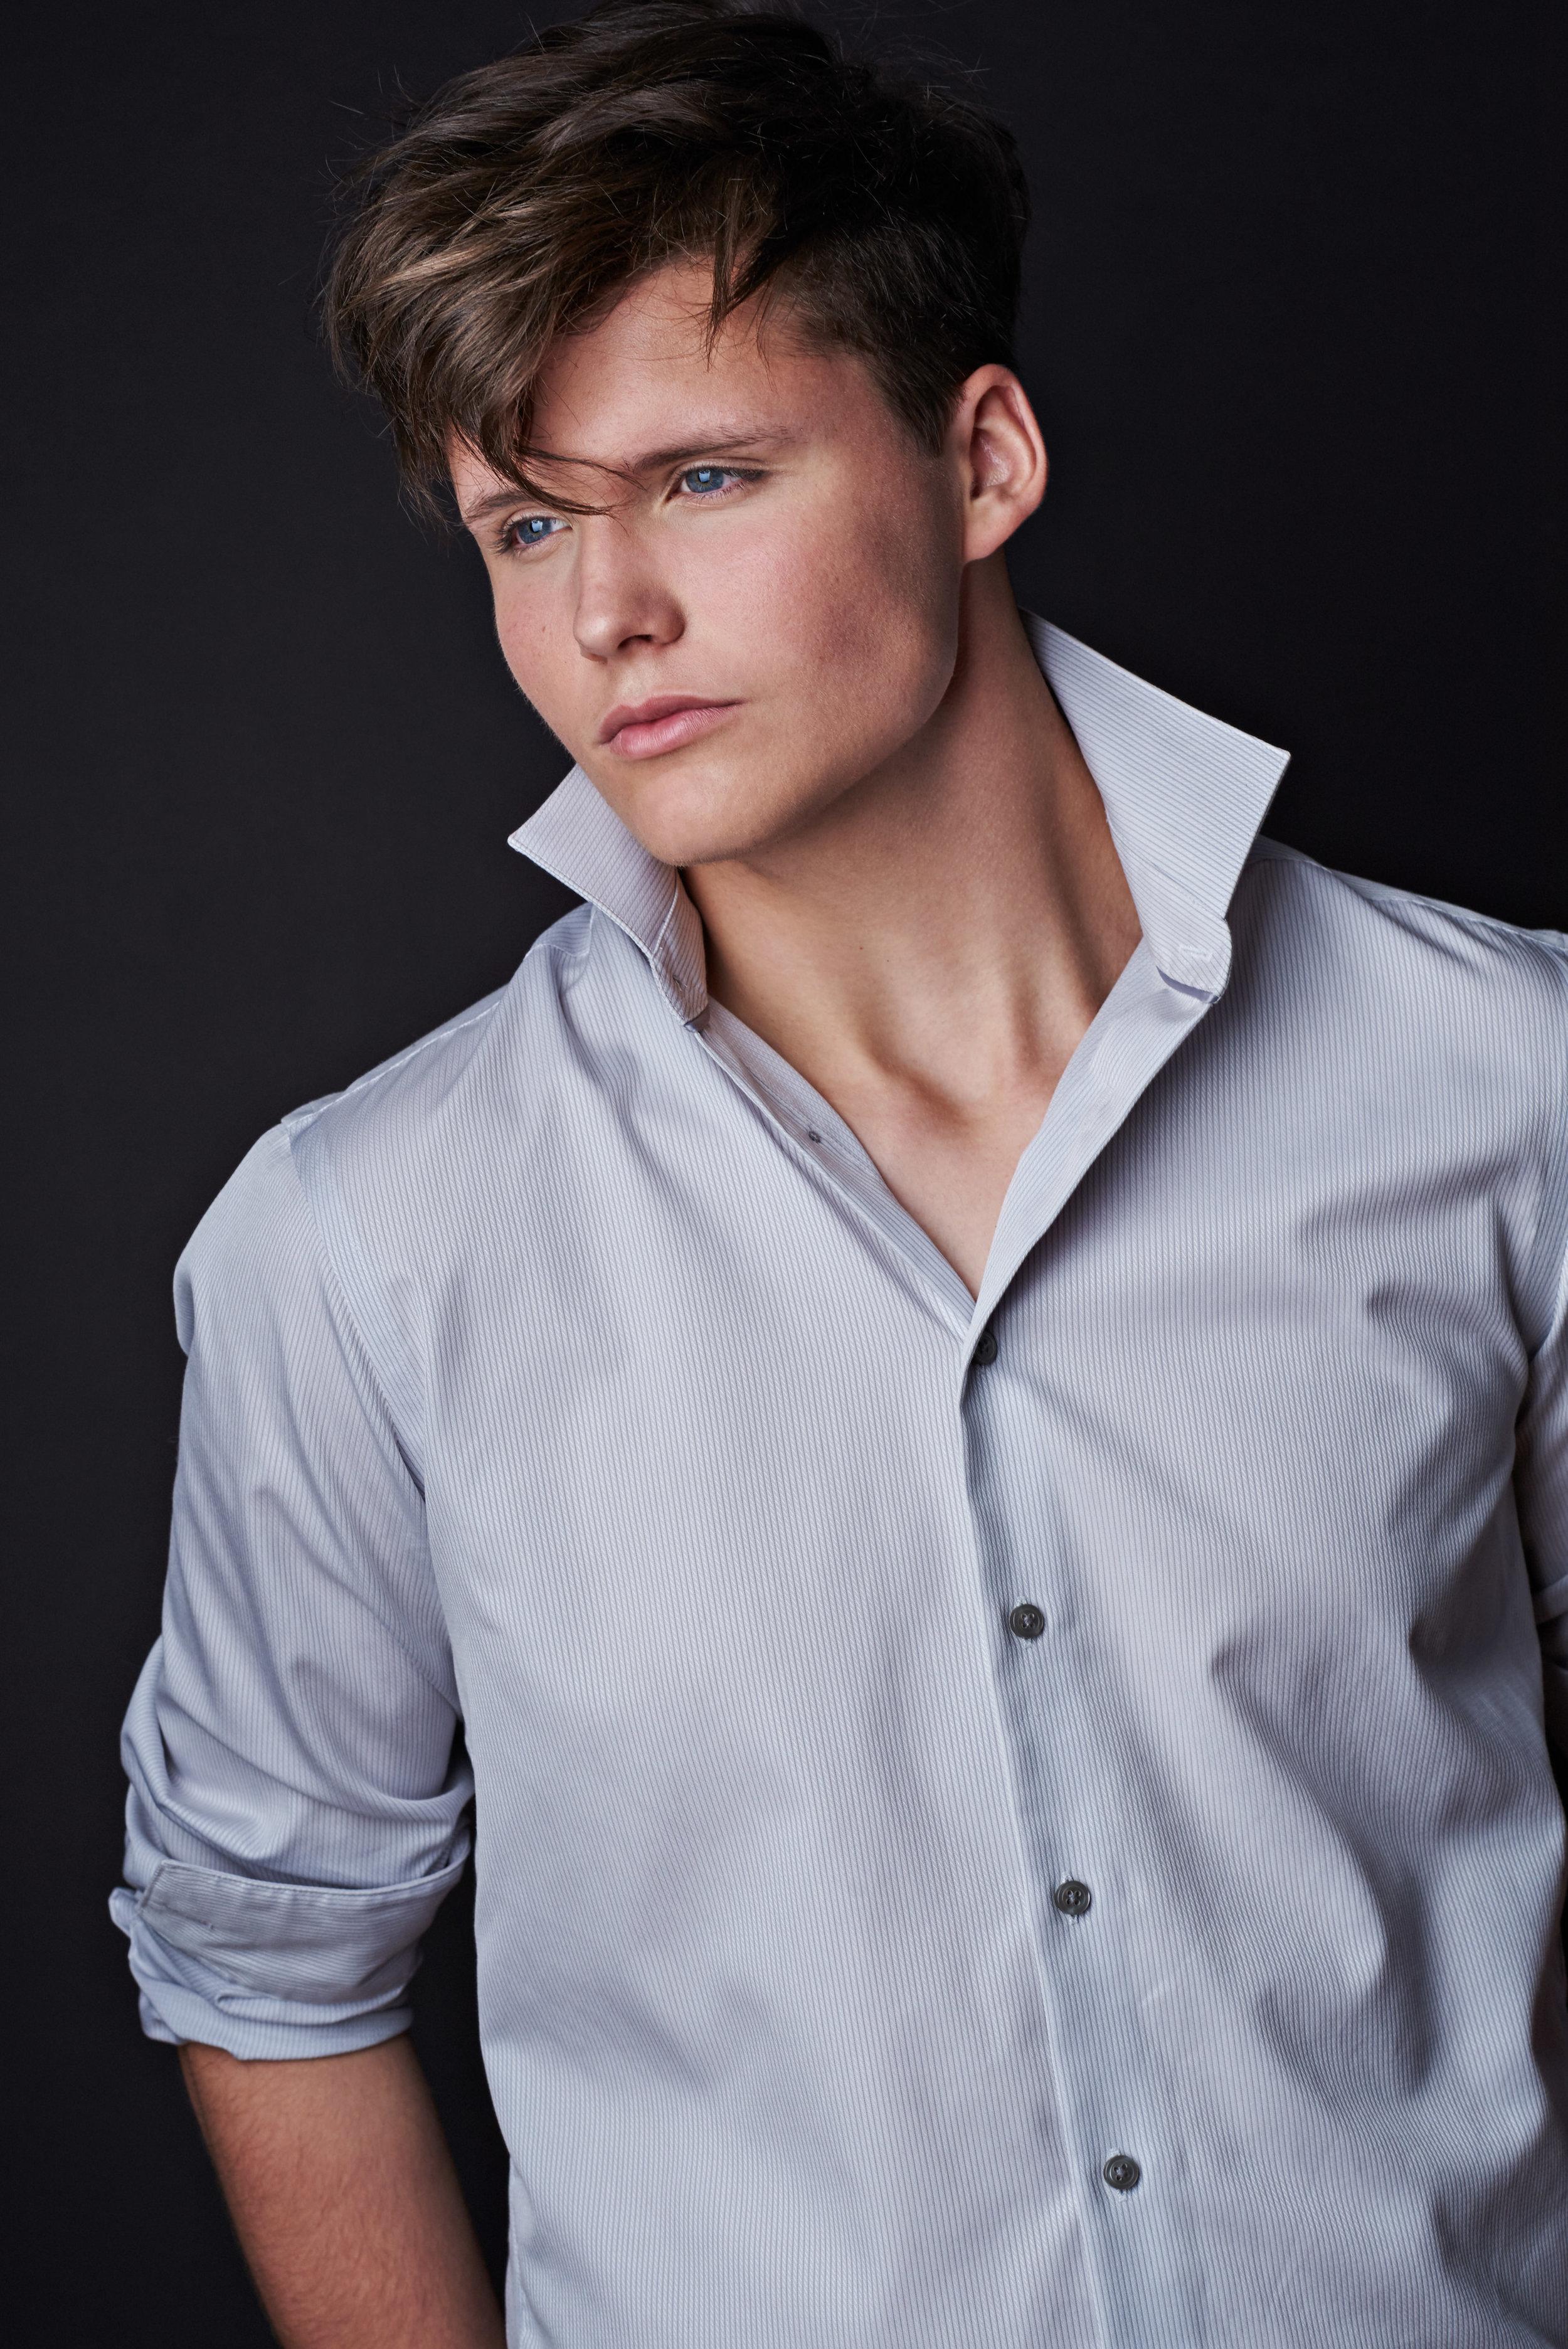 Marta-Hewson-Brayden-Schaefer-male-model-5904.jpg